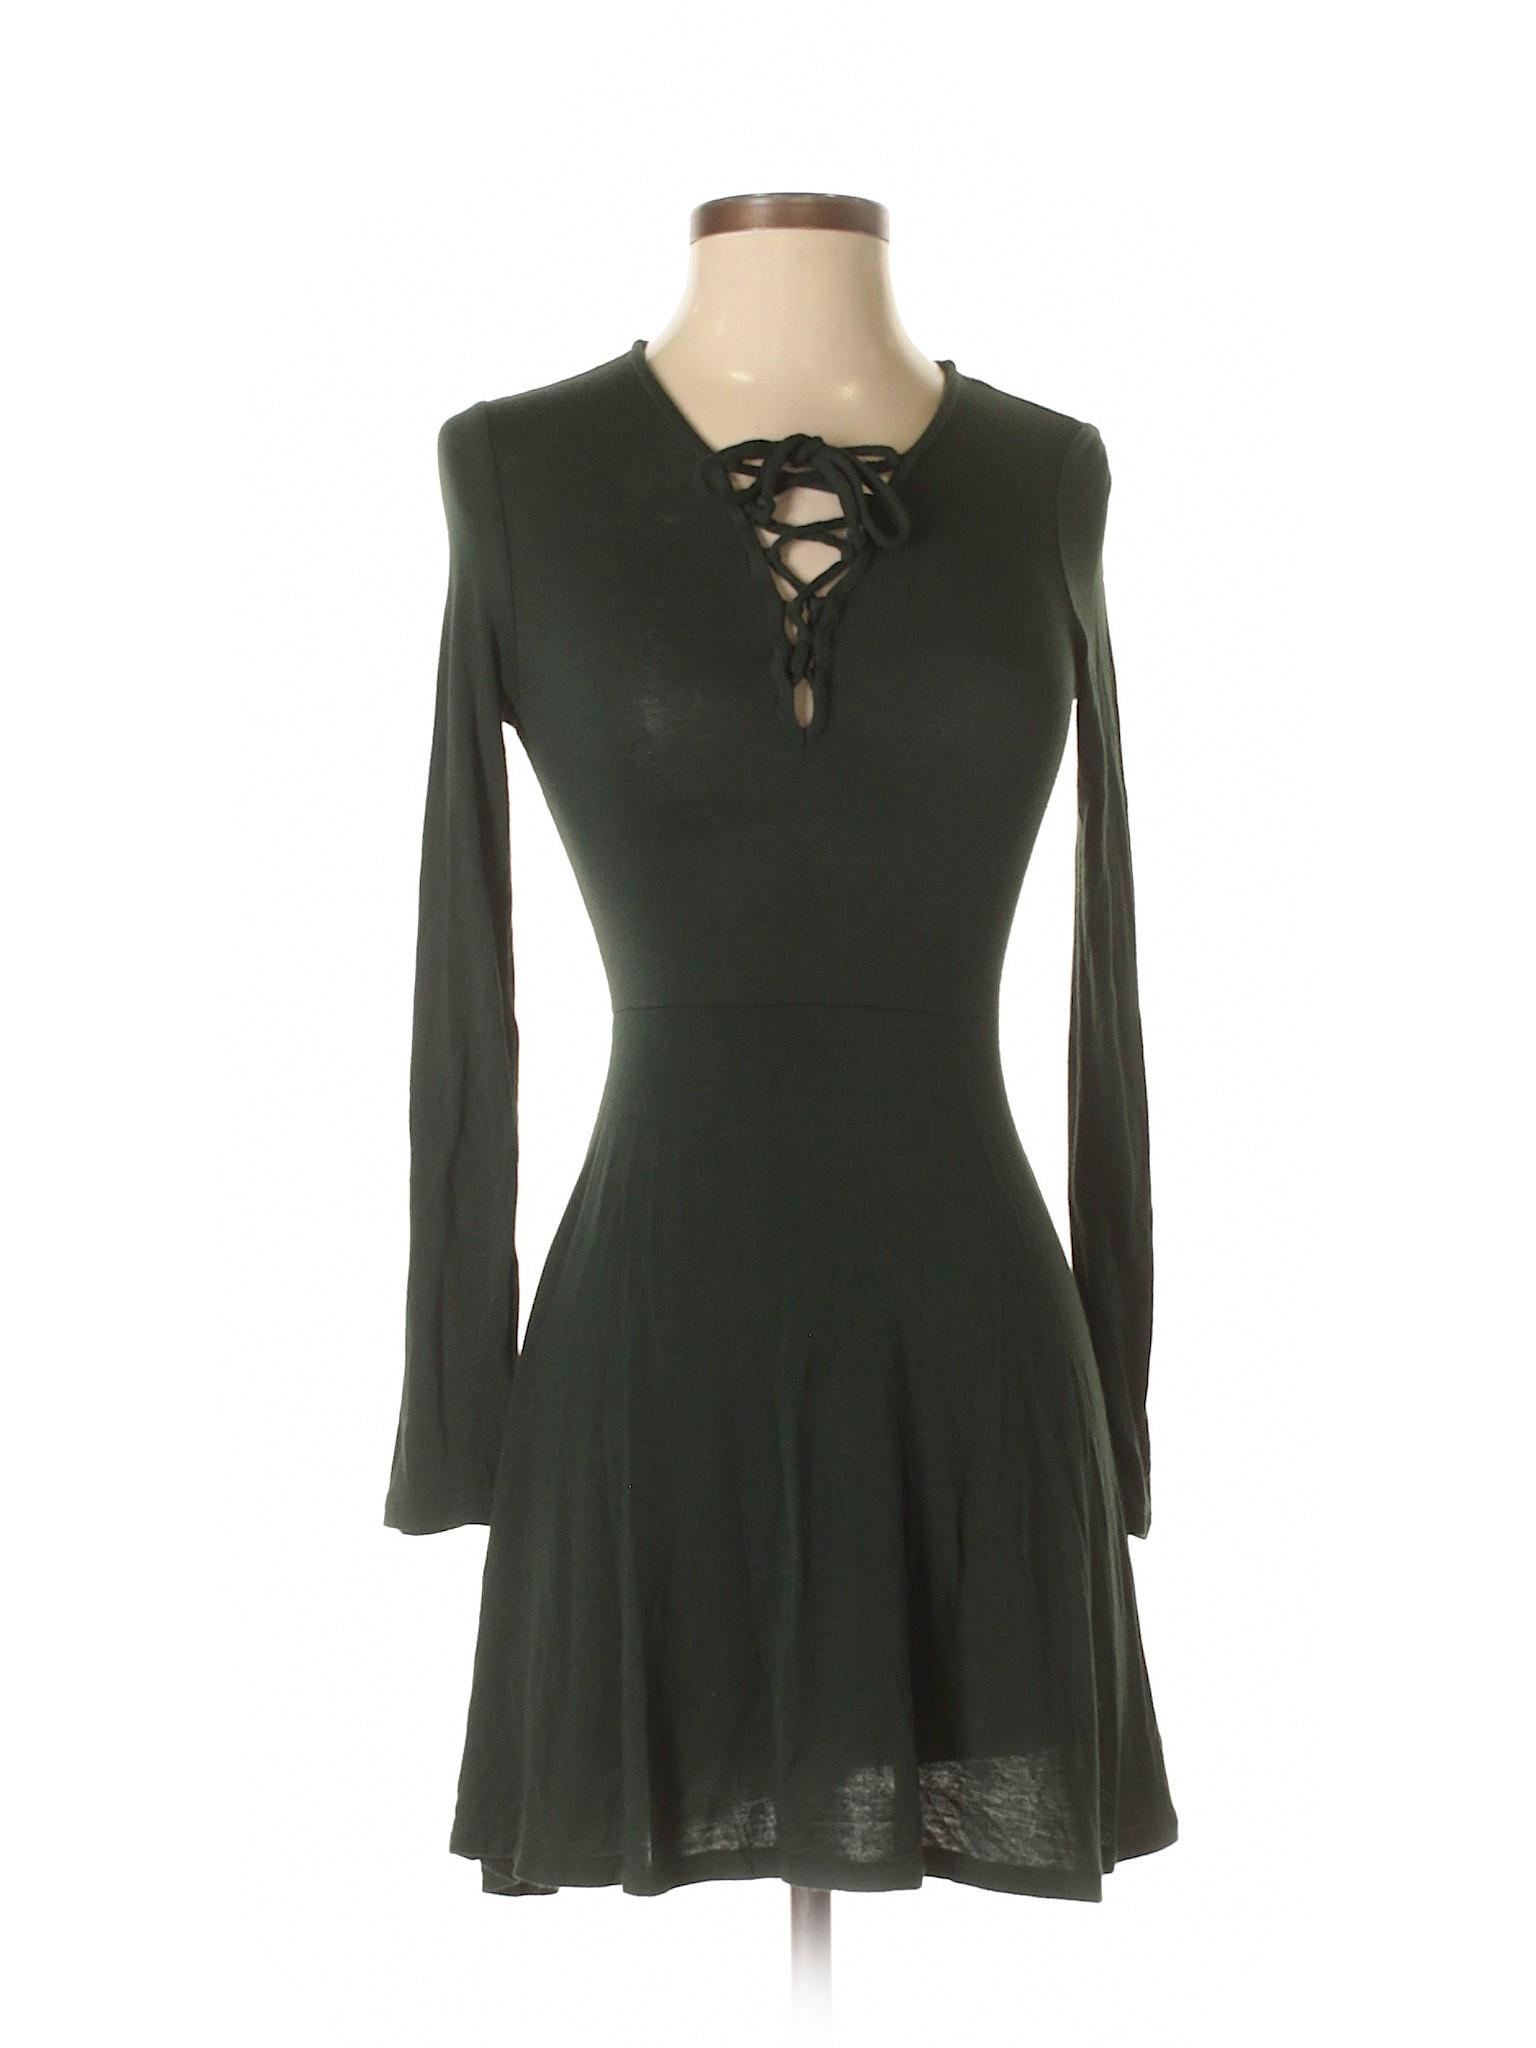 Xhilaration Xhilaration Dress Selling Casual Selling Dress Casual Iq8aw